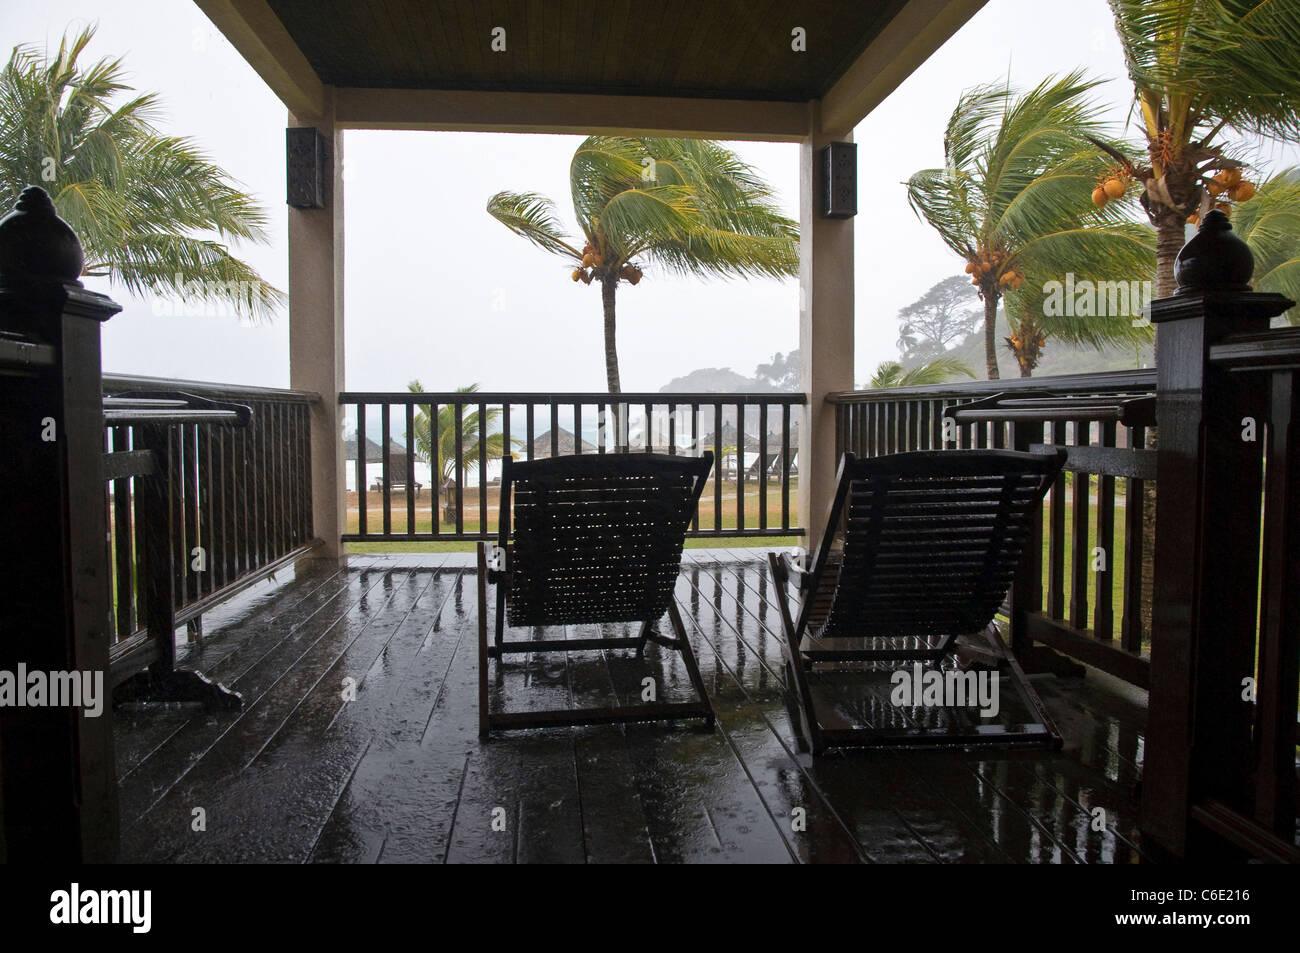 Sun terrace in the rain, thunderstorm, monsoon, Laguna Redang Island Resort, Pulau Redang island, Malaysia, Southeast Asia, Asia Stock Photo